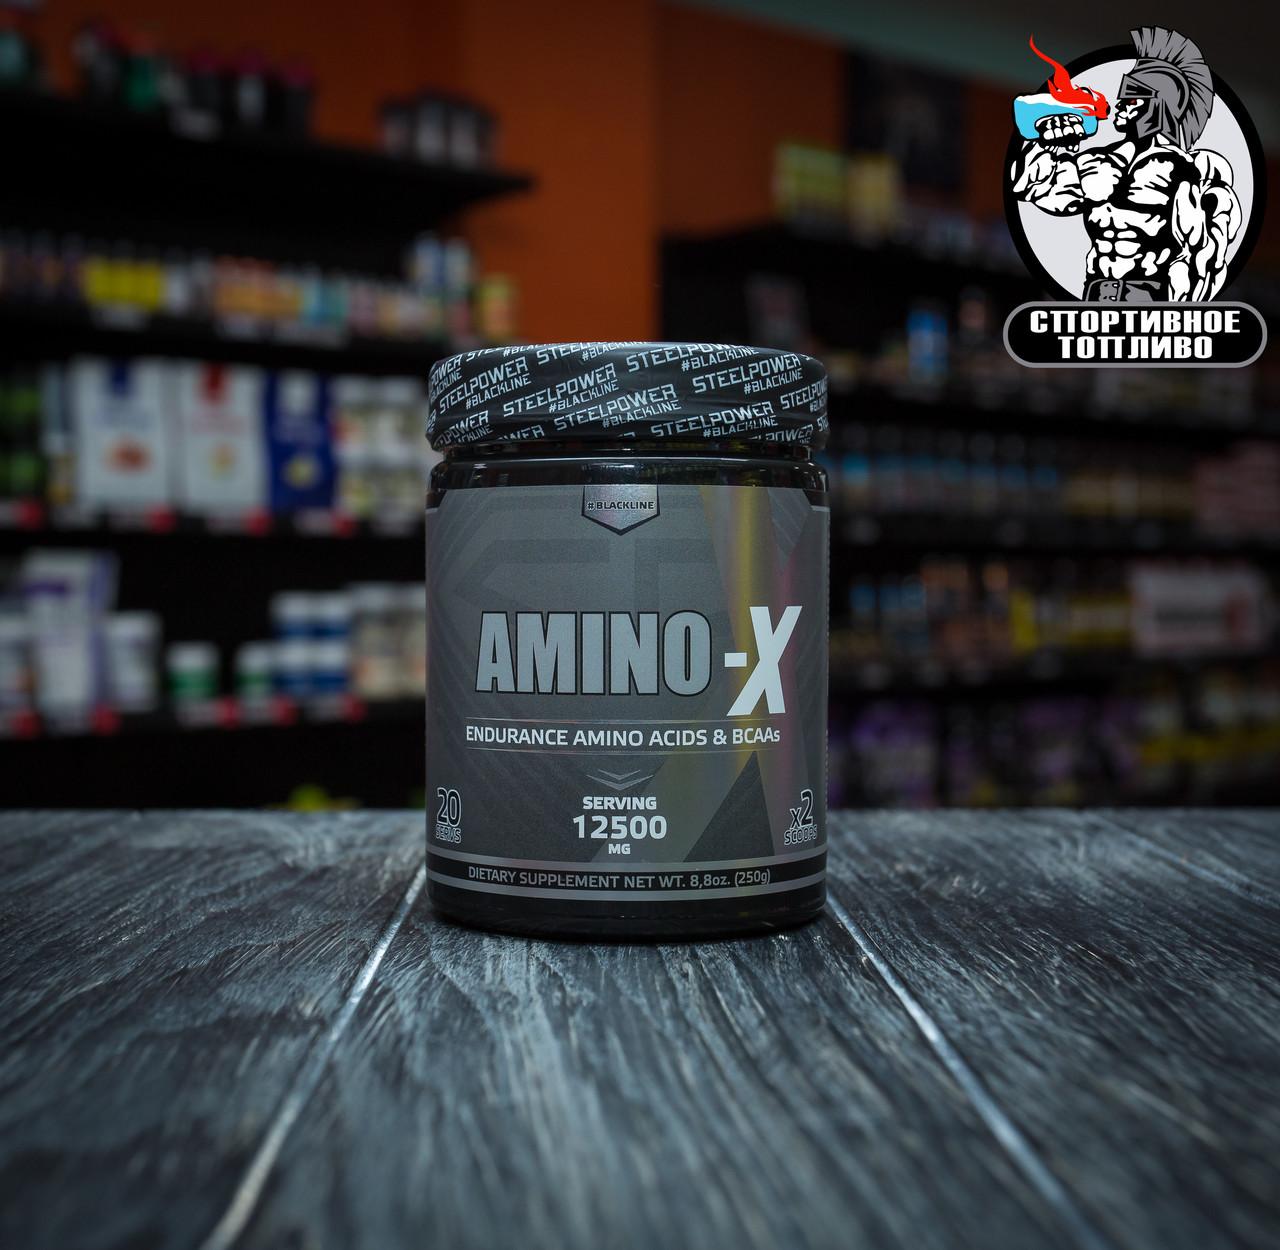 Amino-X 20порций/250гр